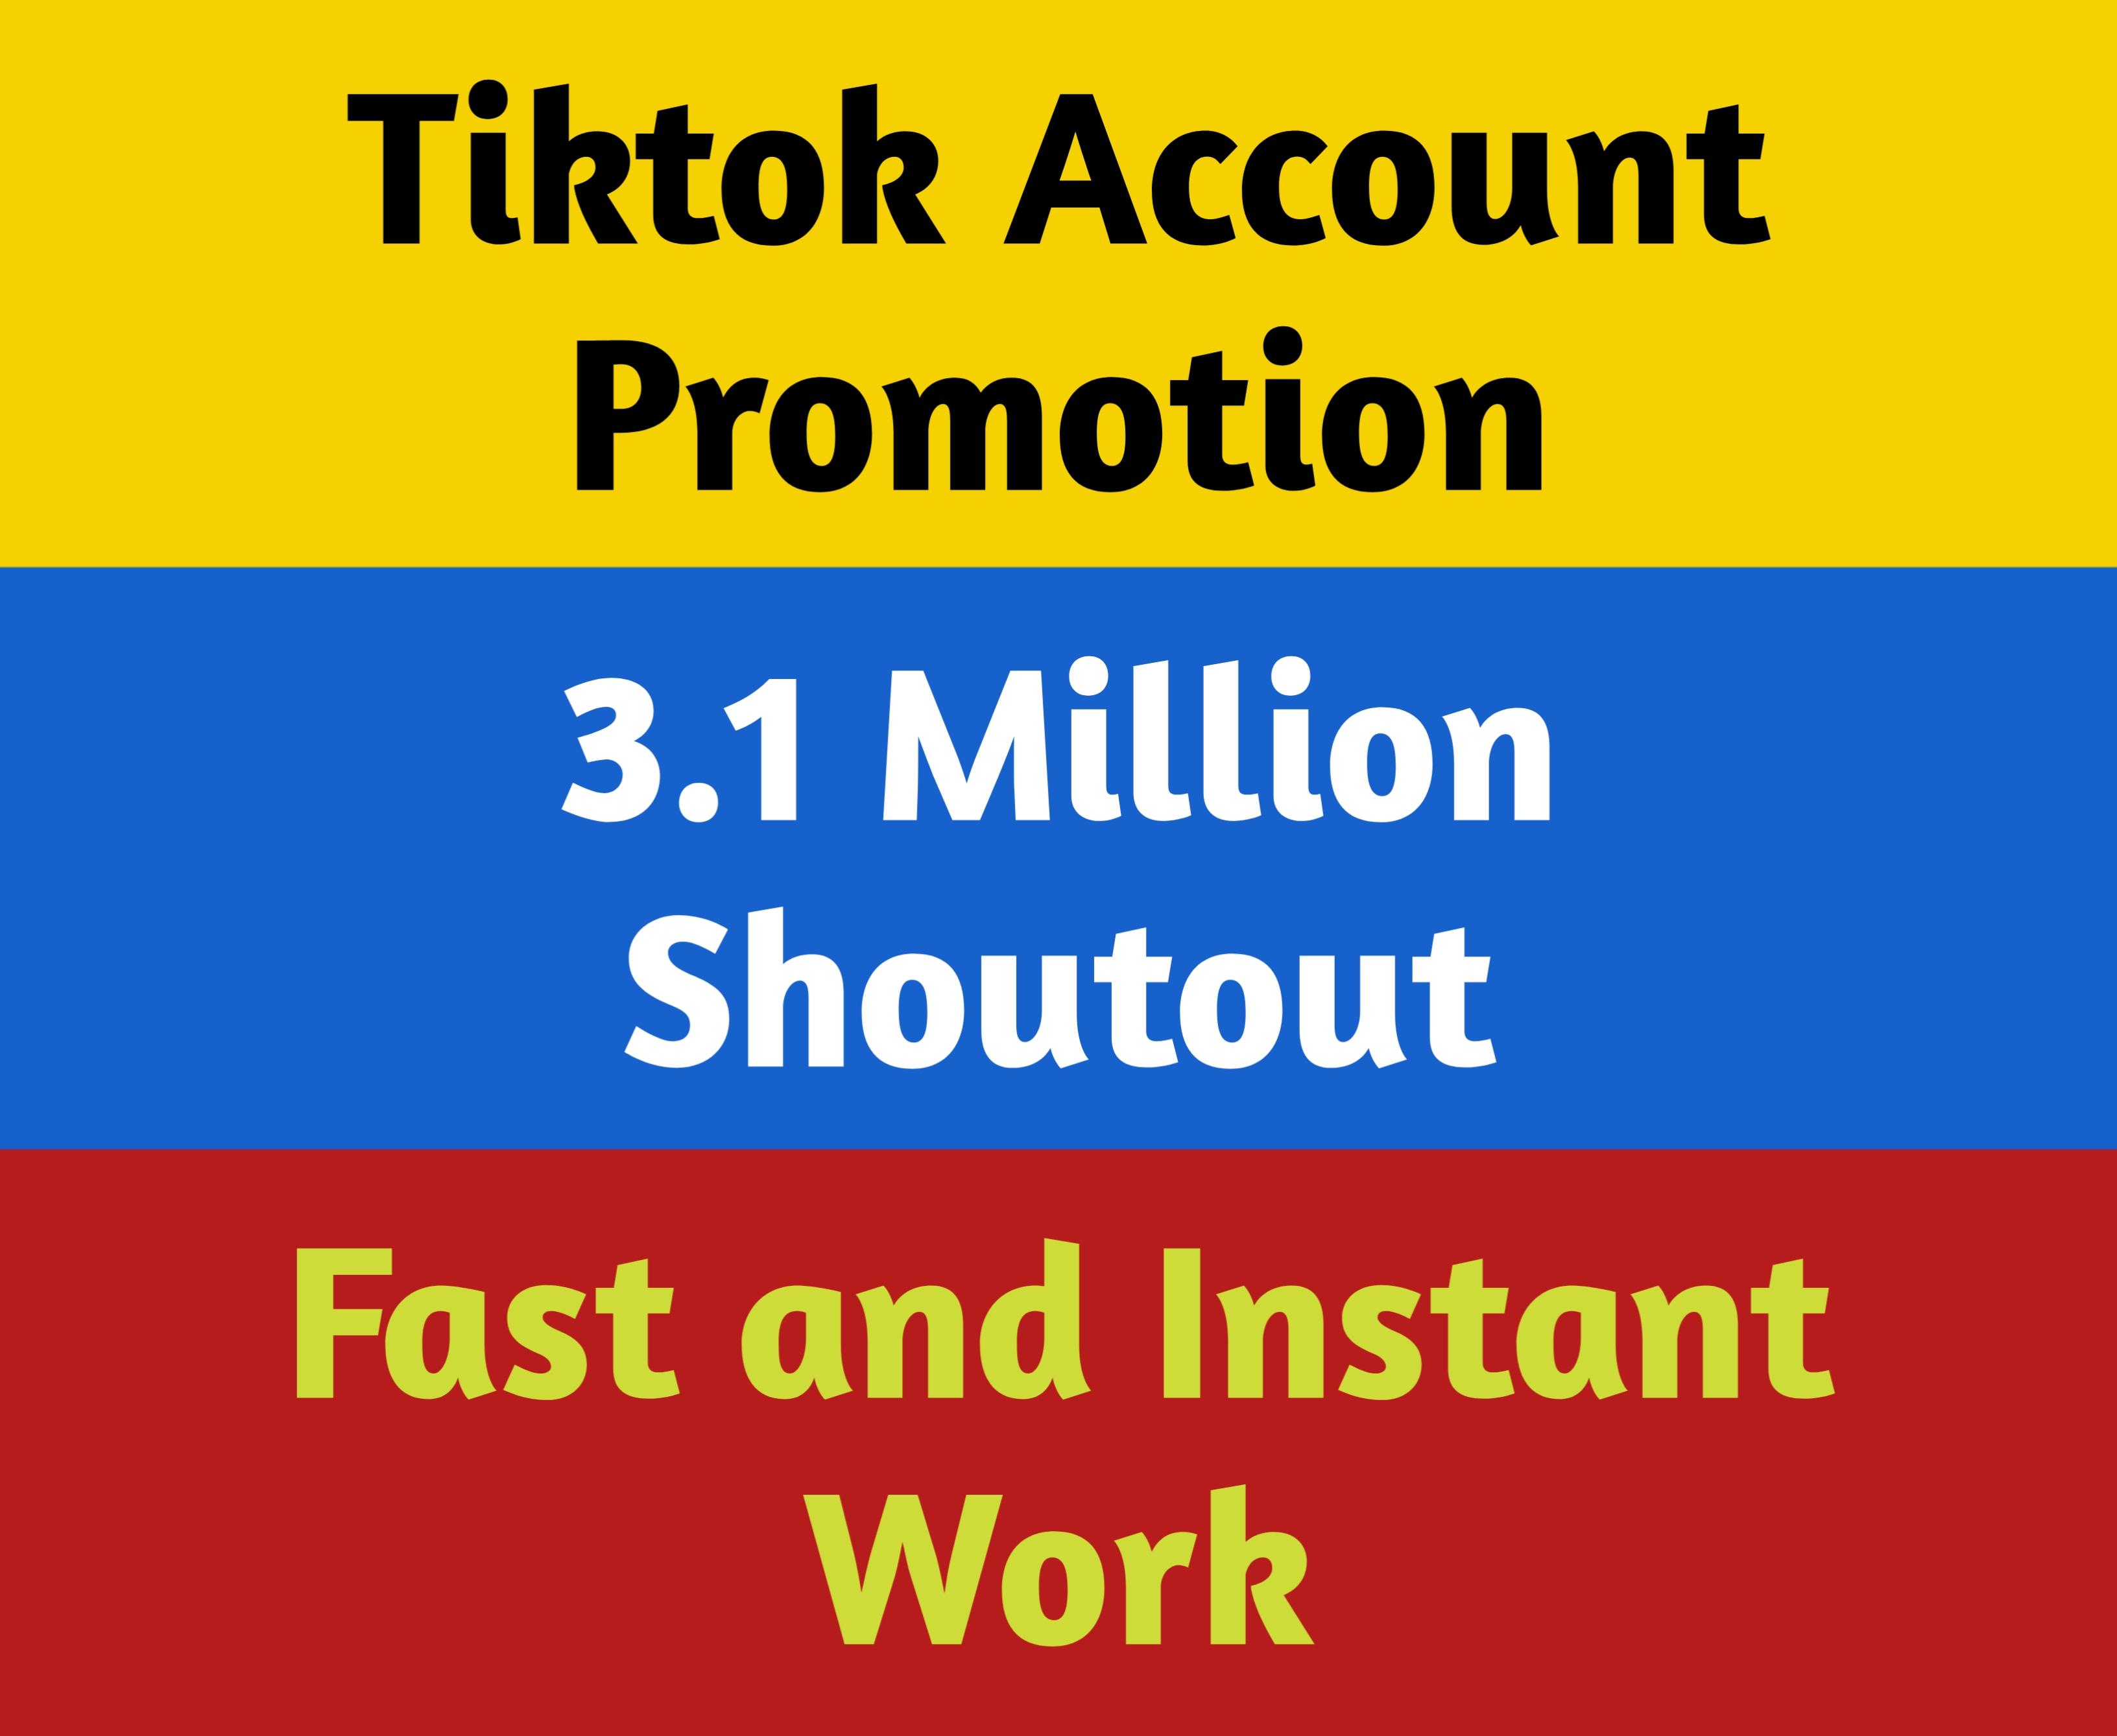 Tiktok Account Marketing and Promotion 3.1 Million Social Audience